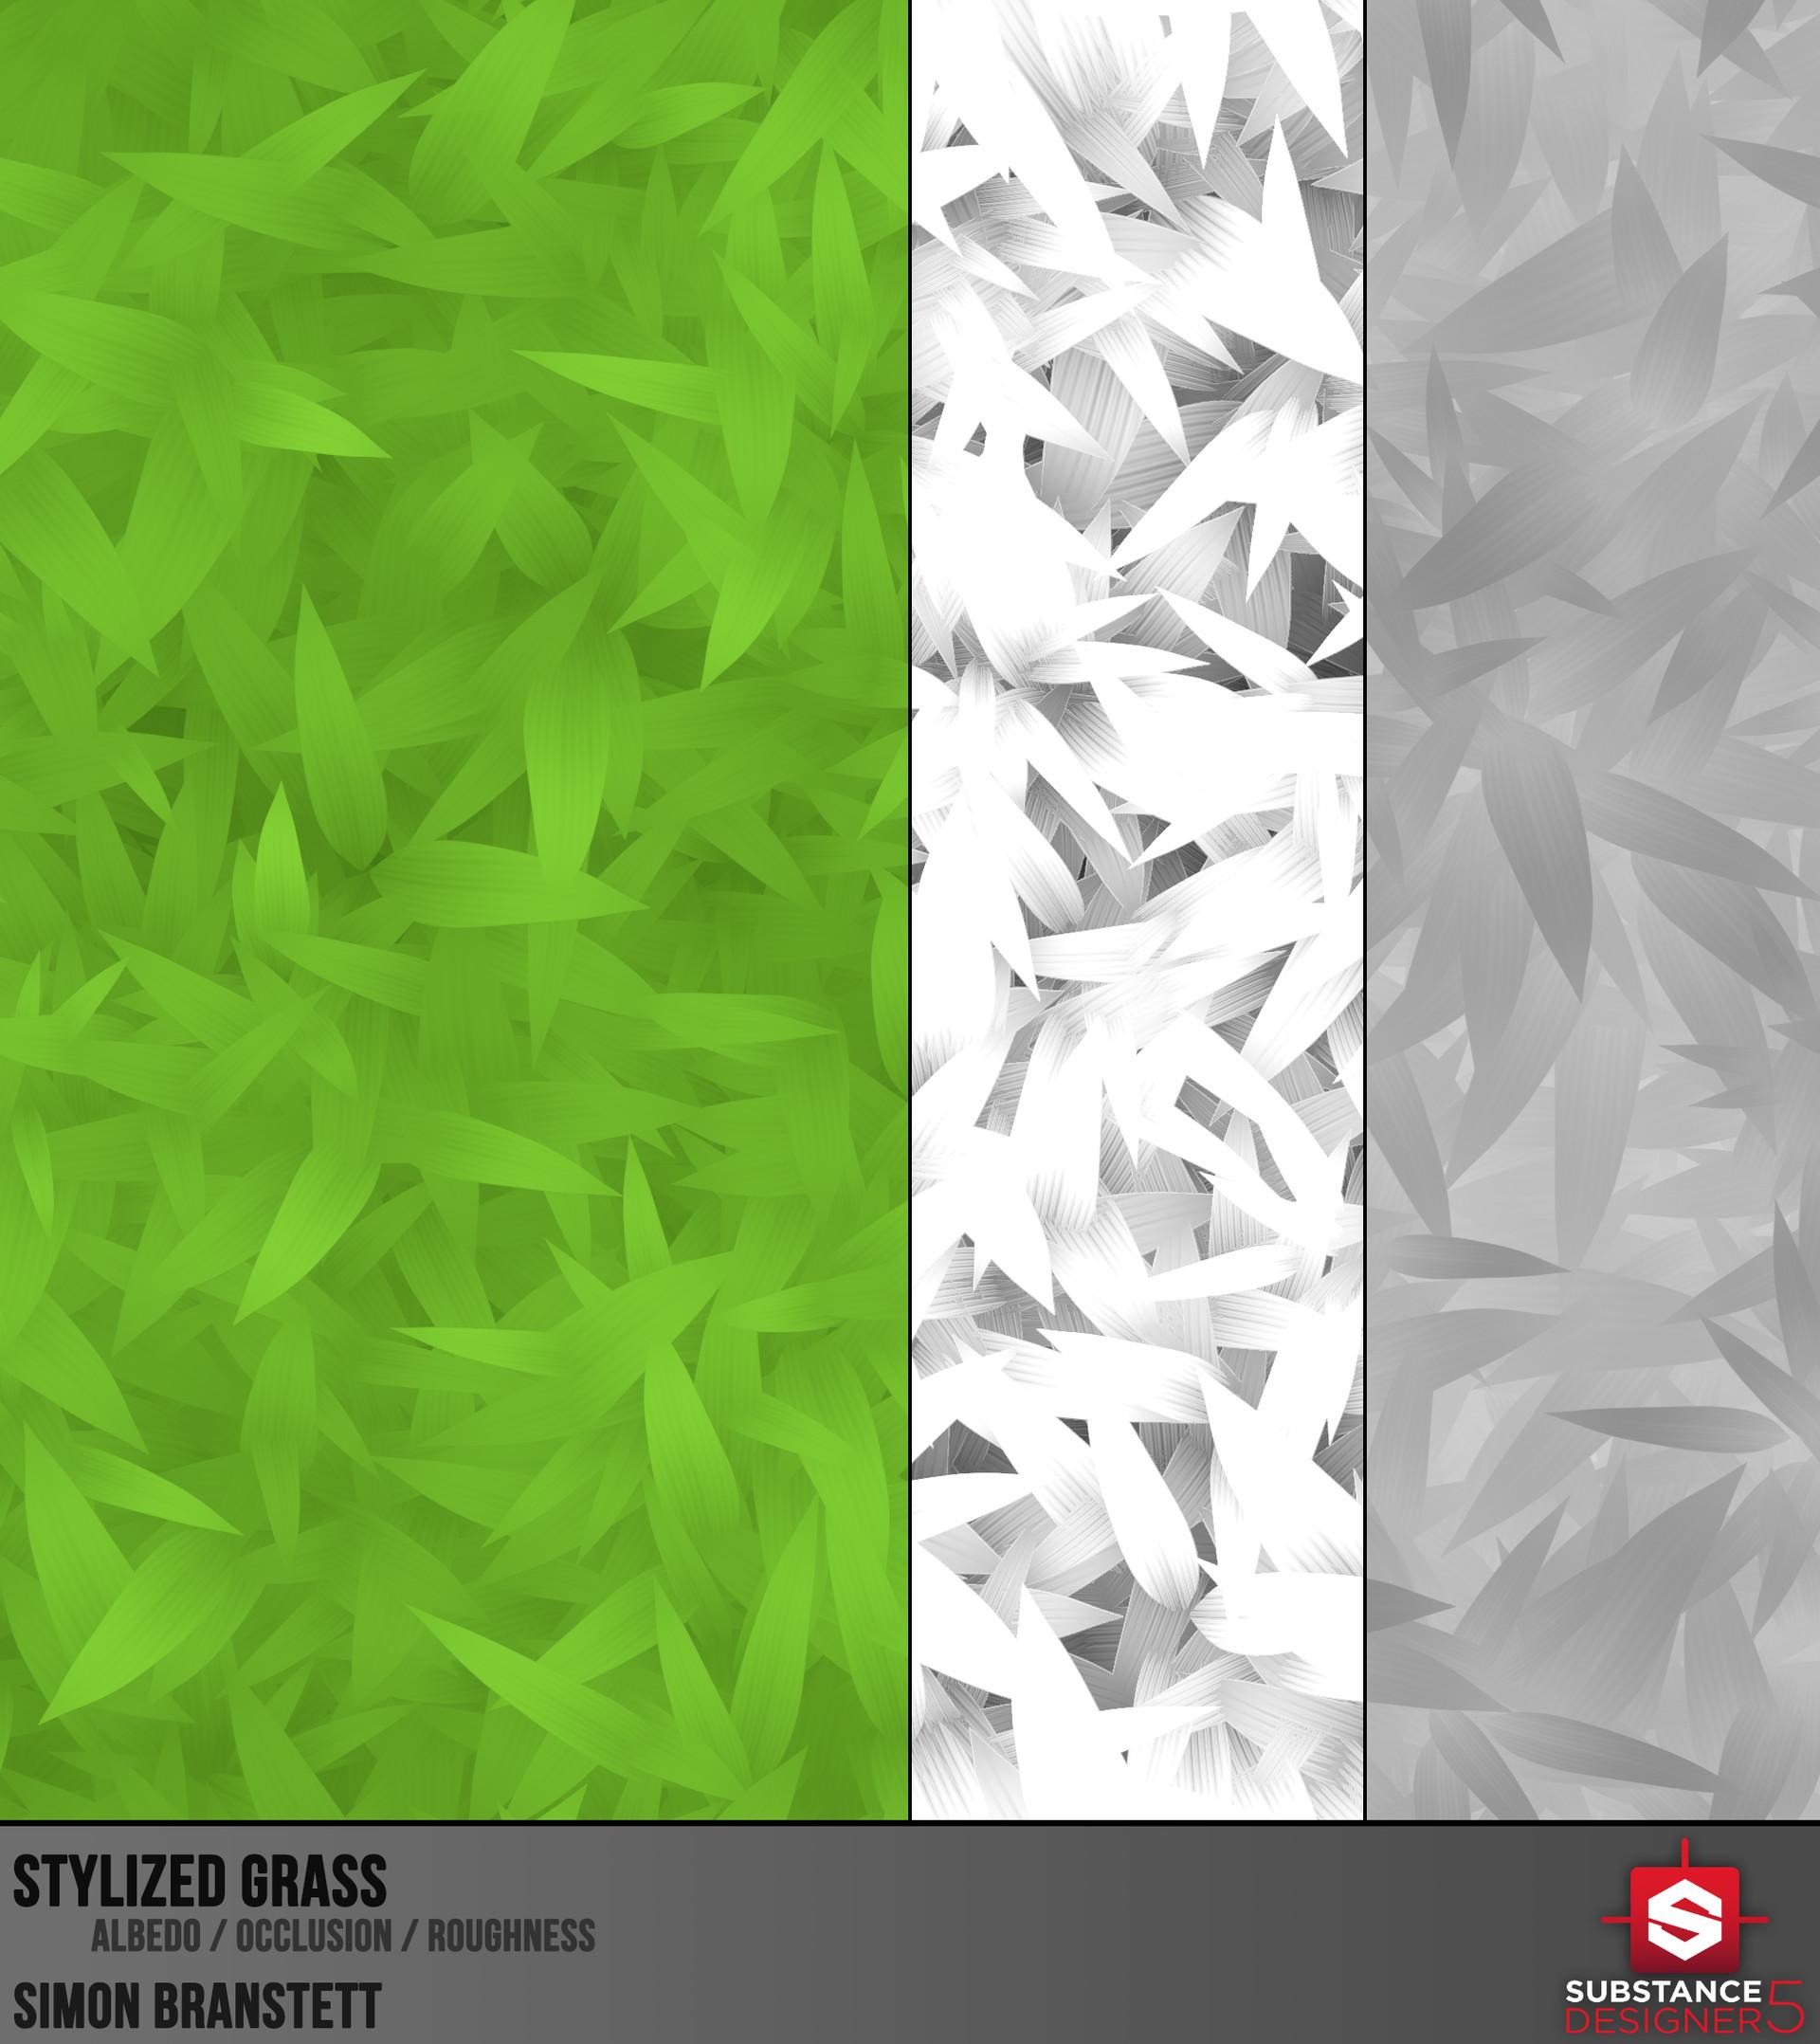 ArtStation - Stylized Grass, Simon Branstett